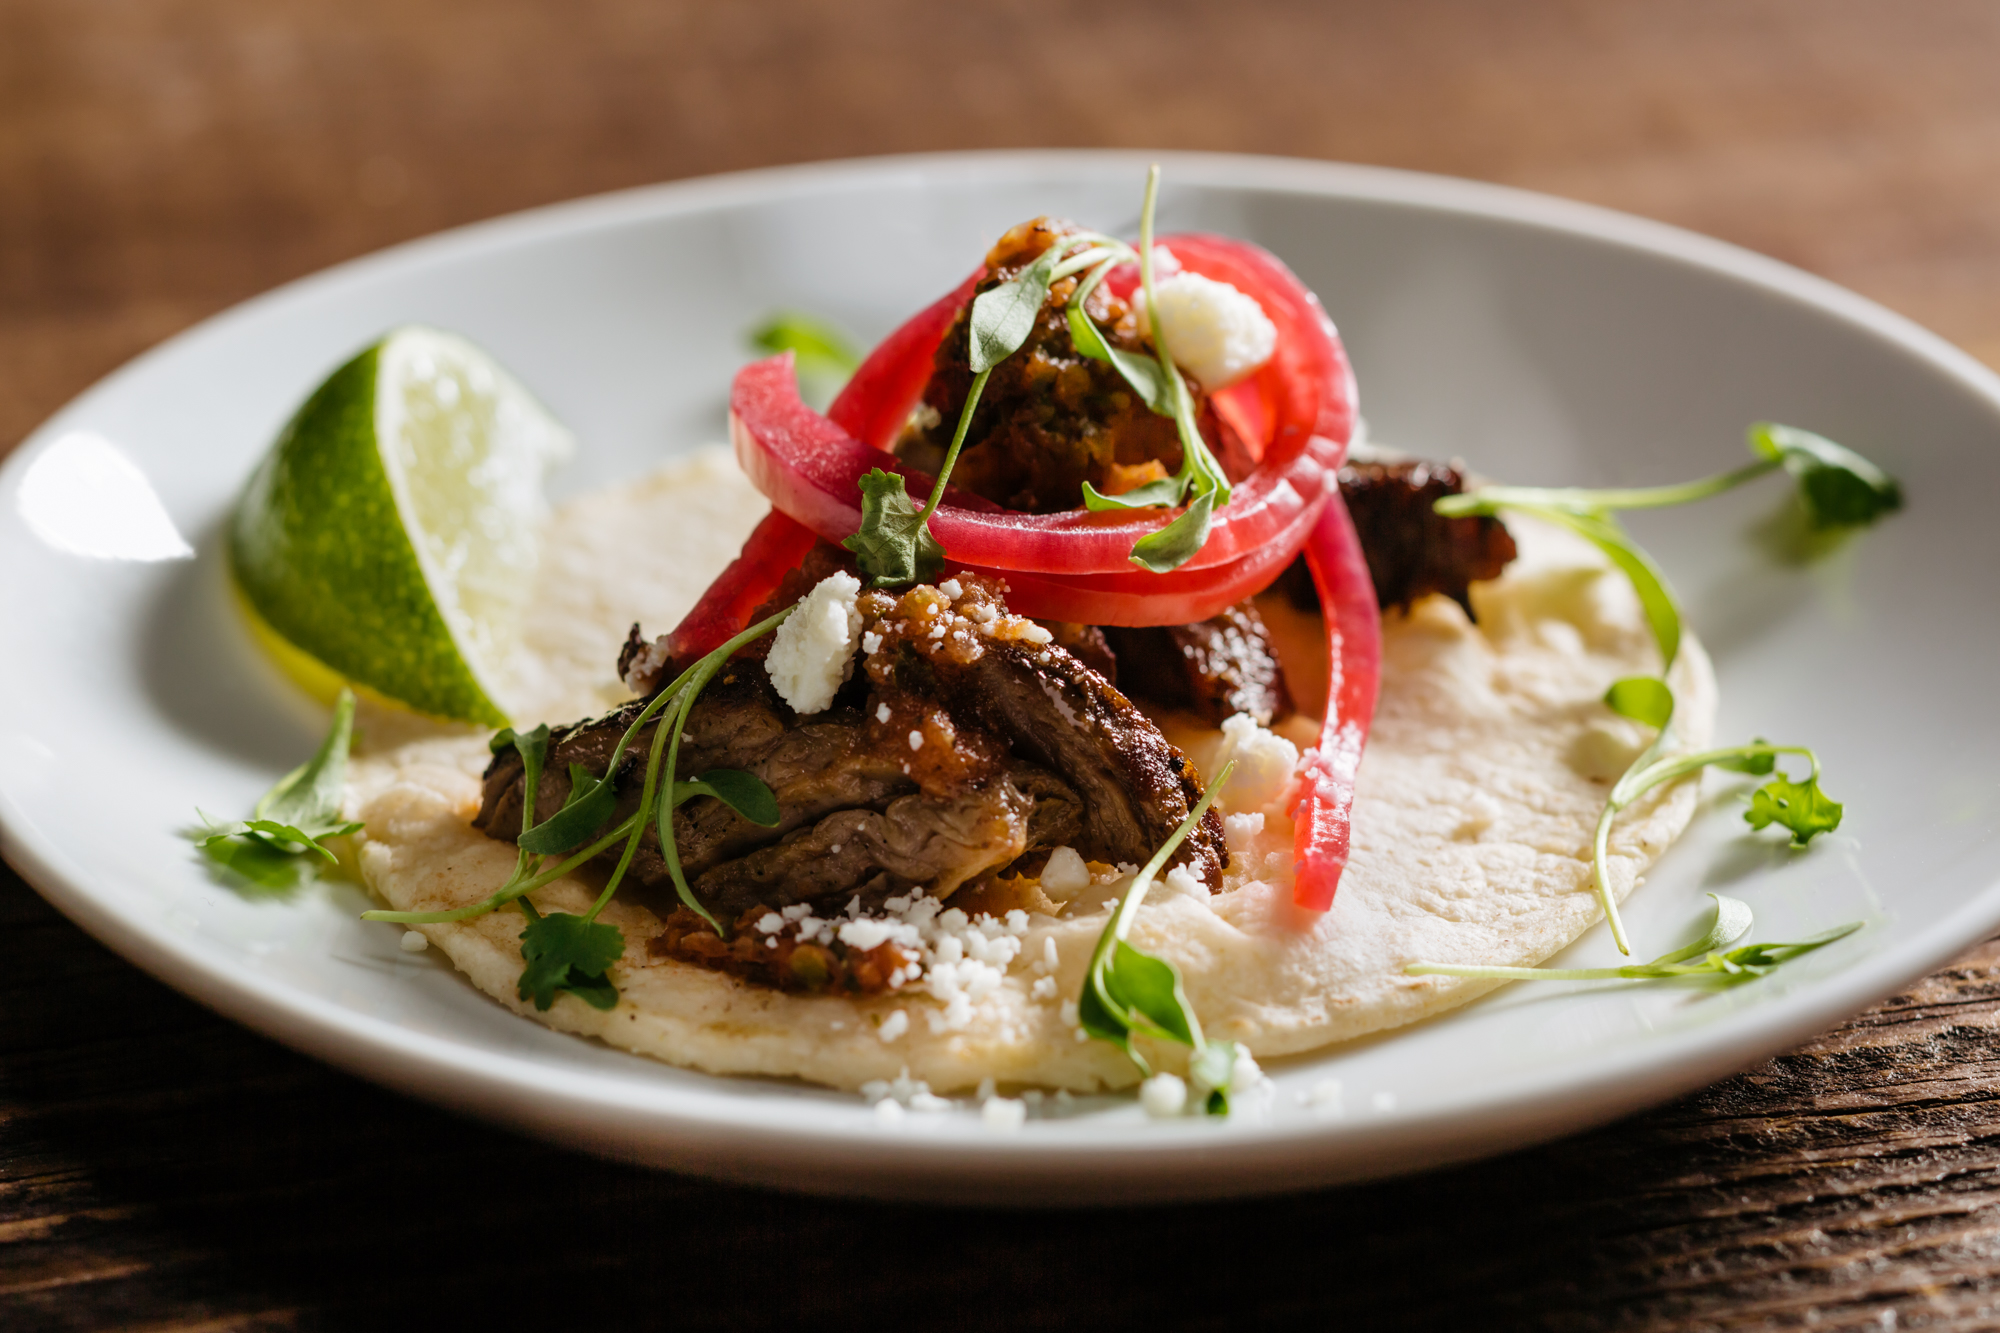 fresh mexican menu catering  San Diego, Palm Springs, Joshua Tree, Temecula, Vista, CA